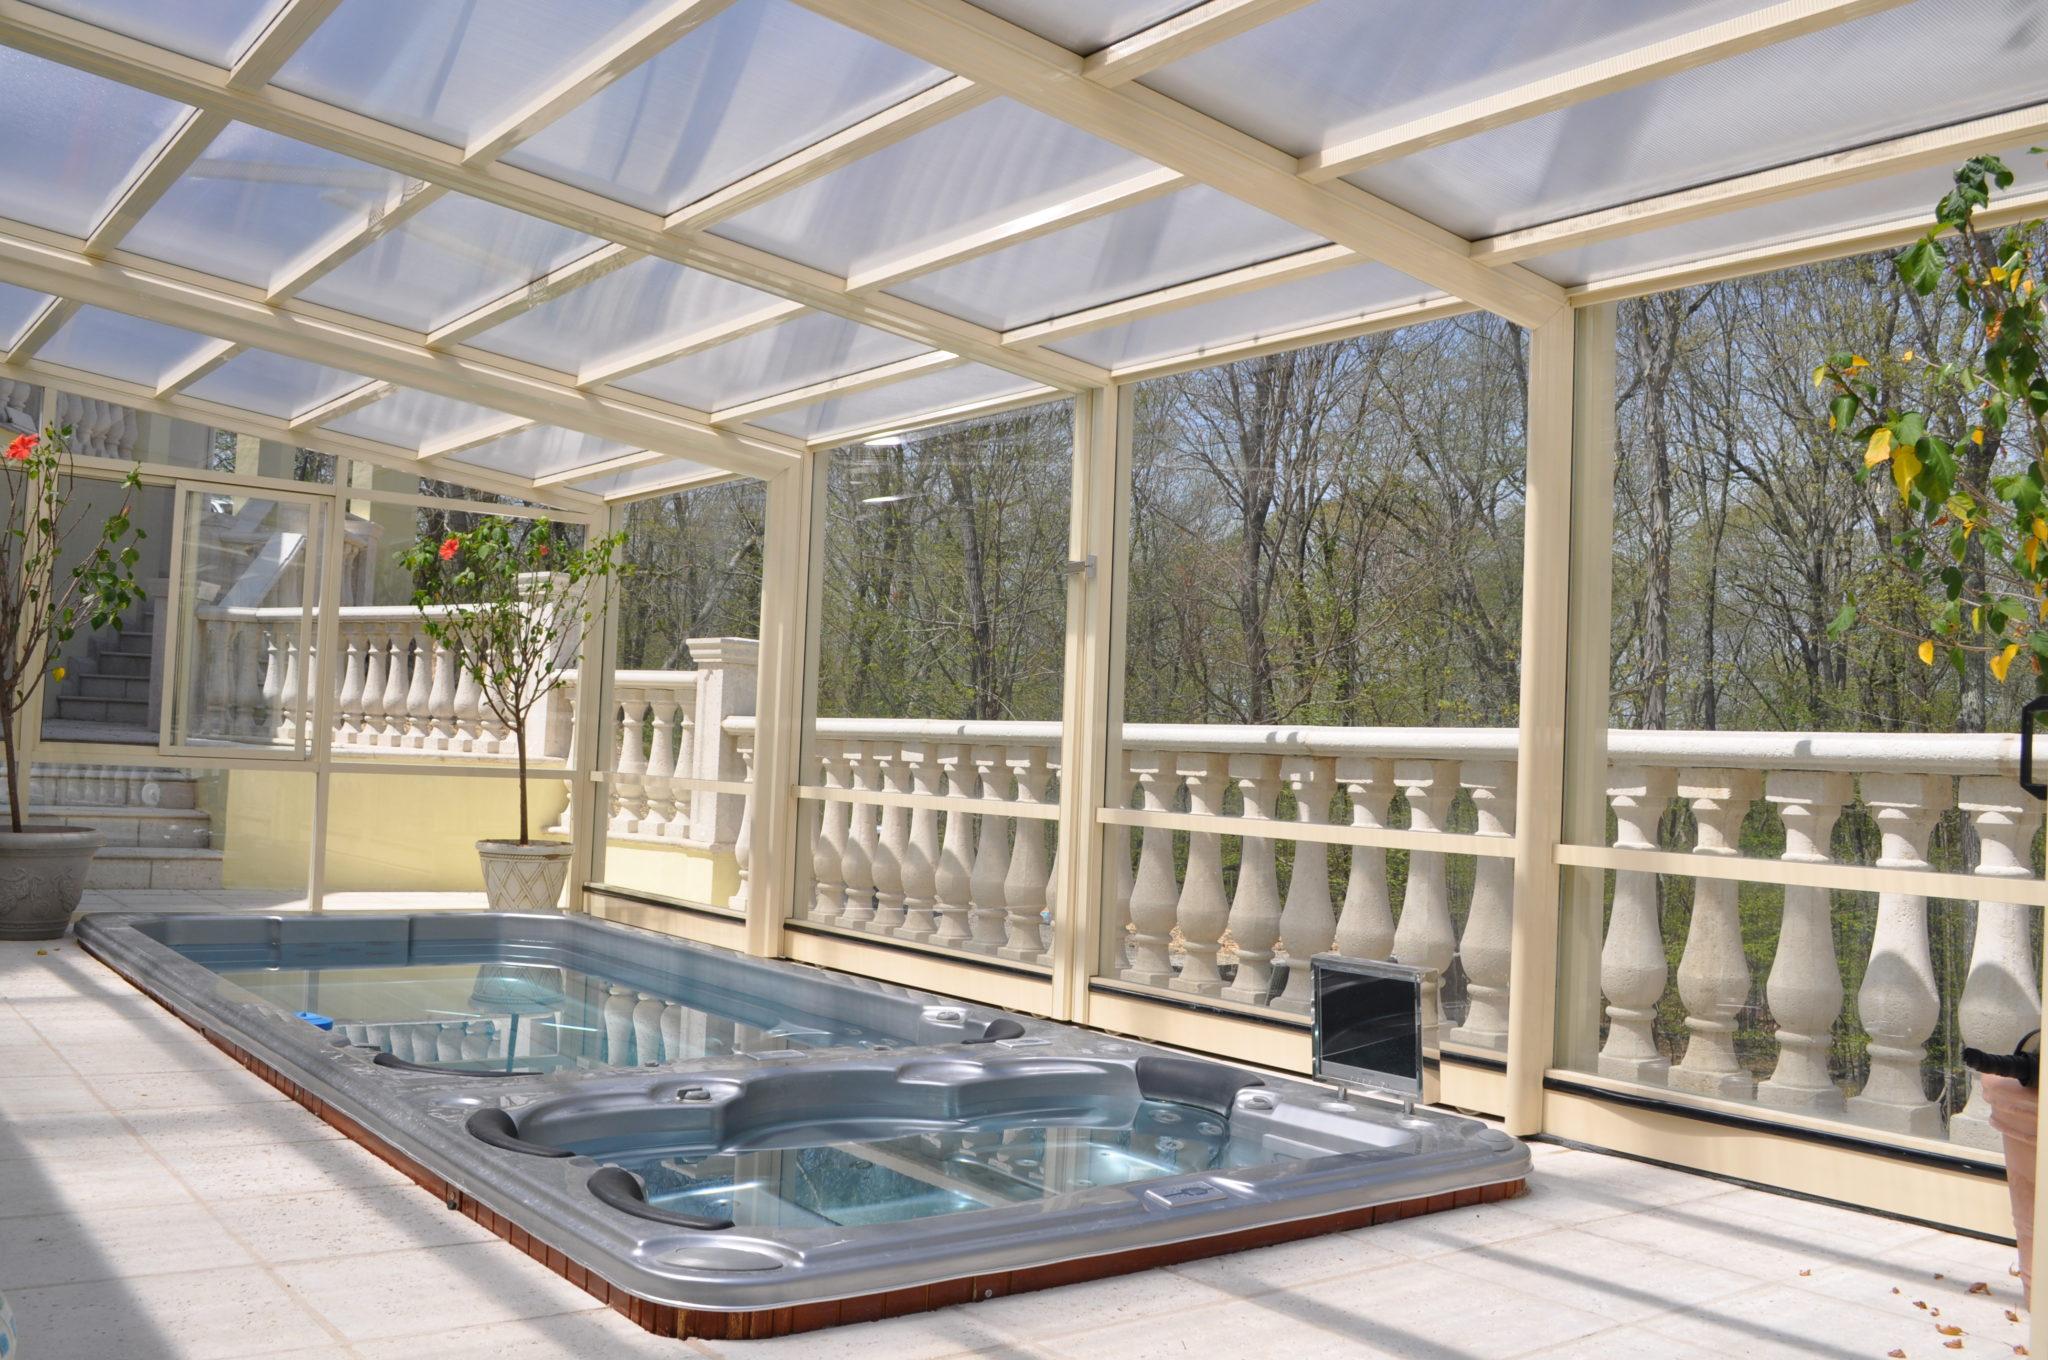 Hot Tub Enclosure 1 - Closed.jpg